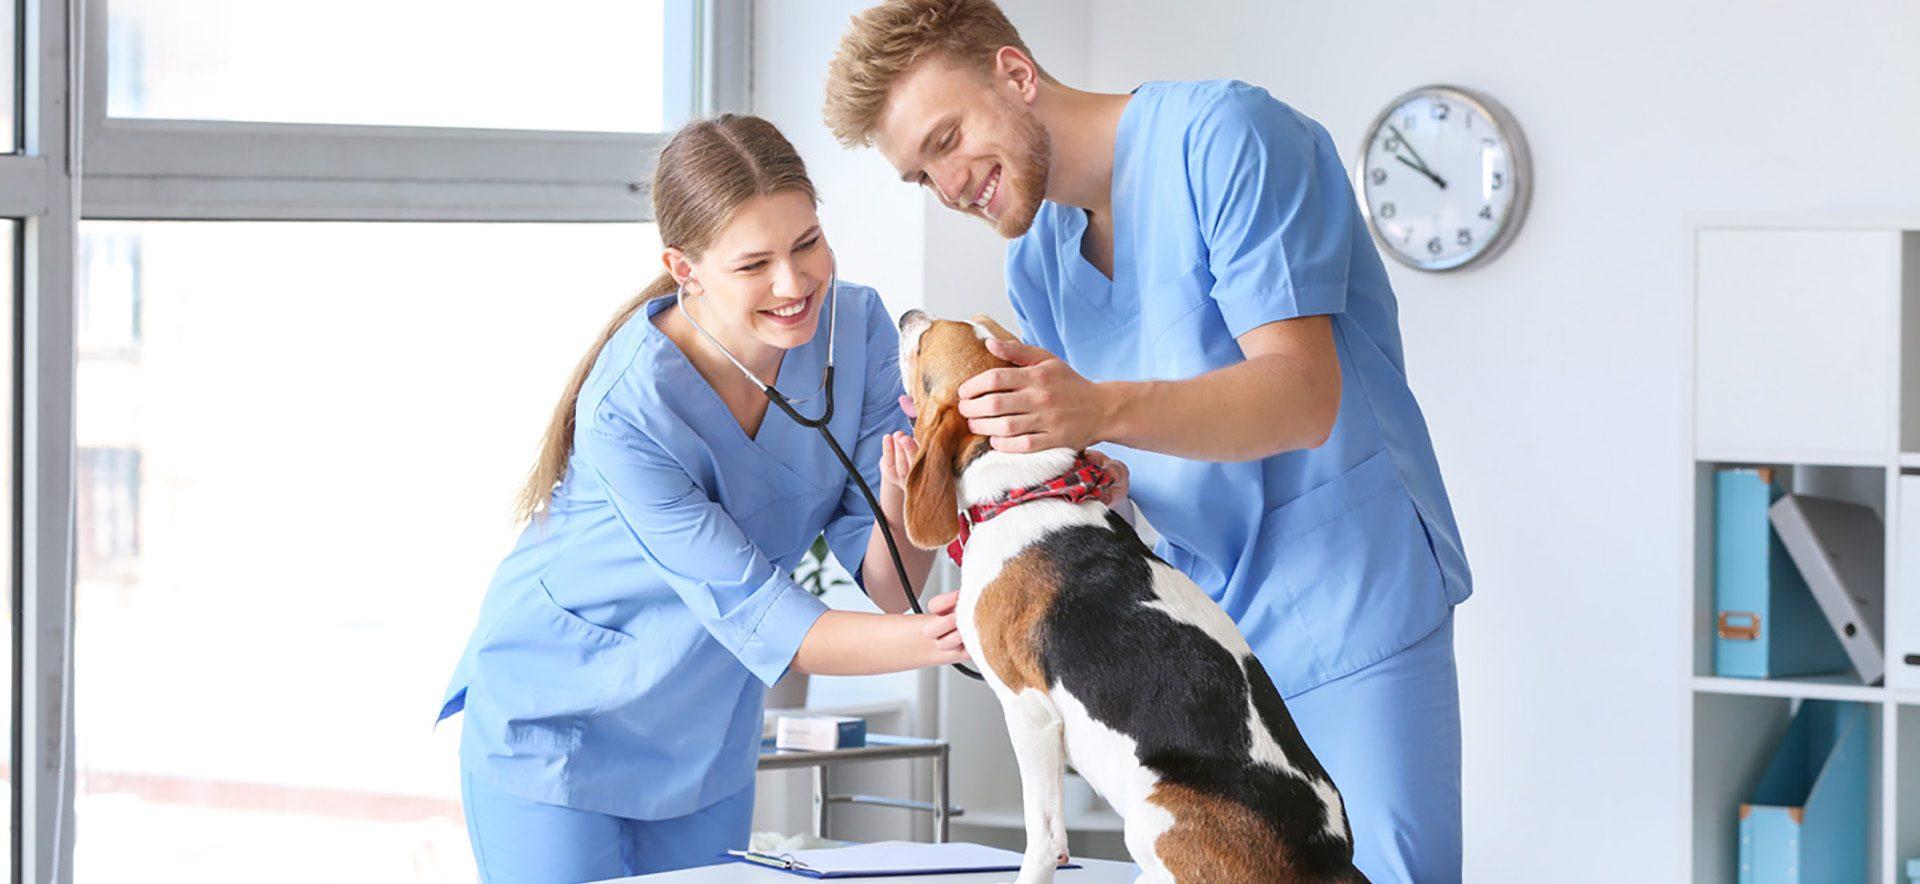 GES118 Veterinary Assistant 1400x700 aspect ratio 100 46